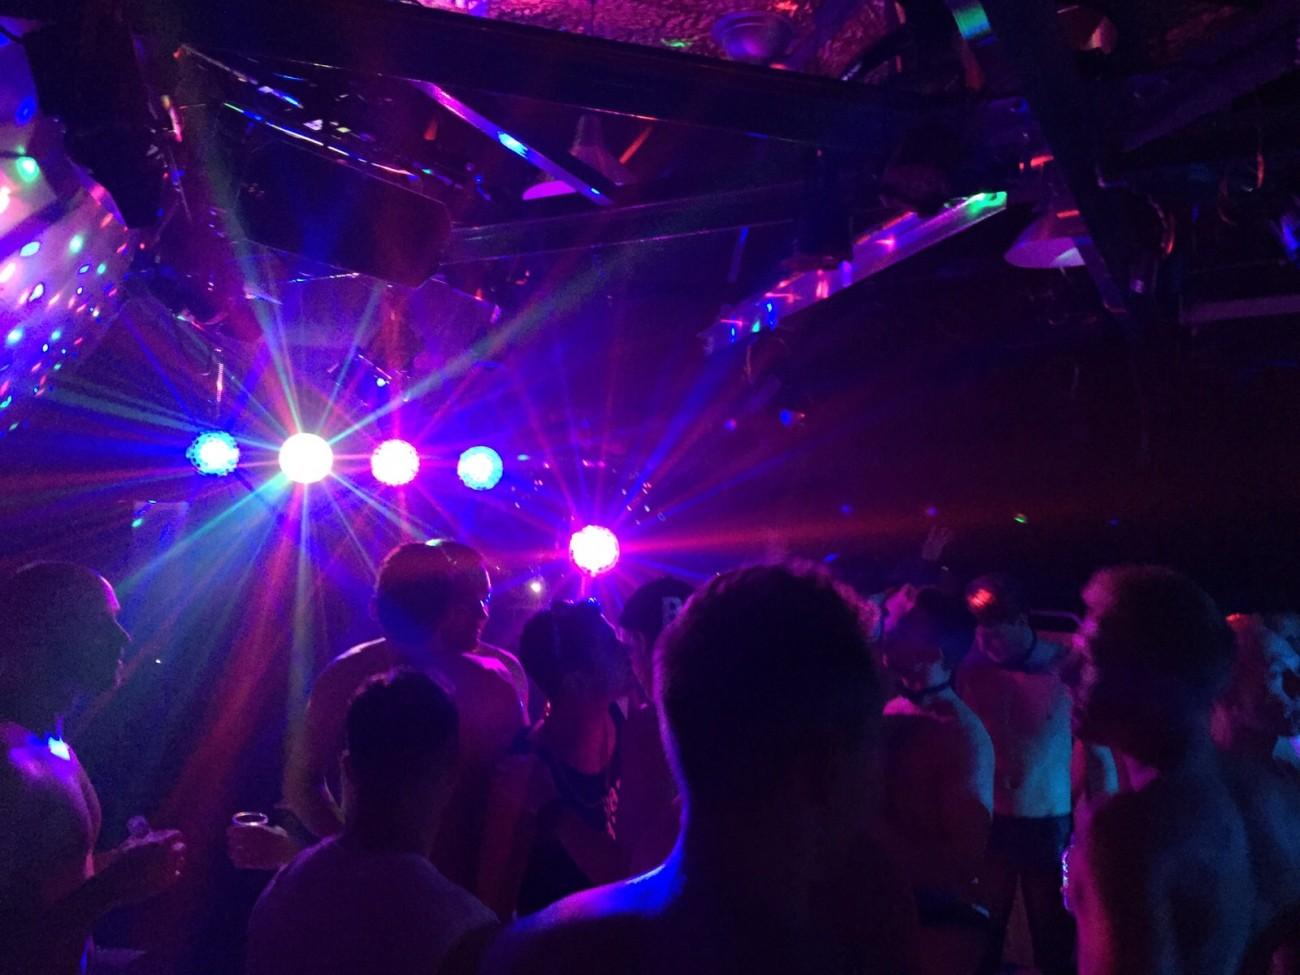 faralda crane hotel amsterdam ndsm best exposure branding music events exclusive private party